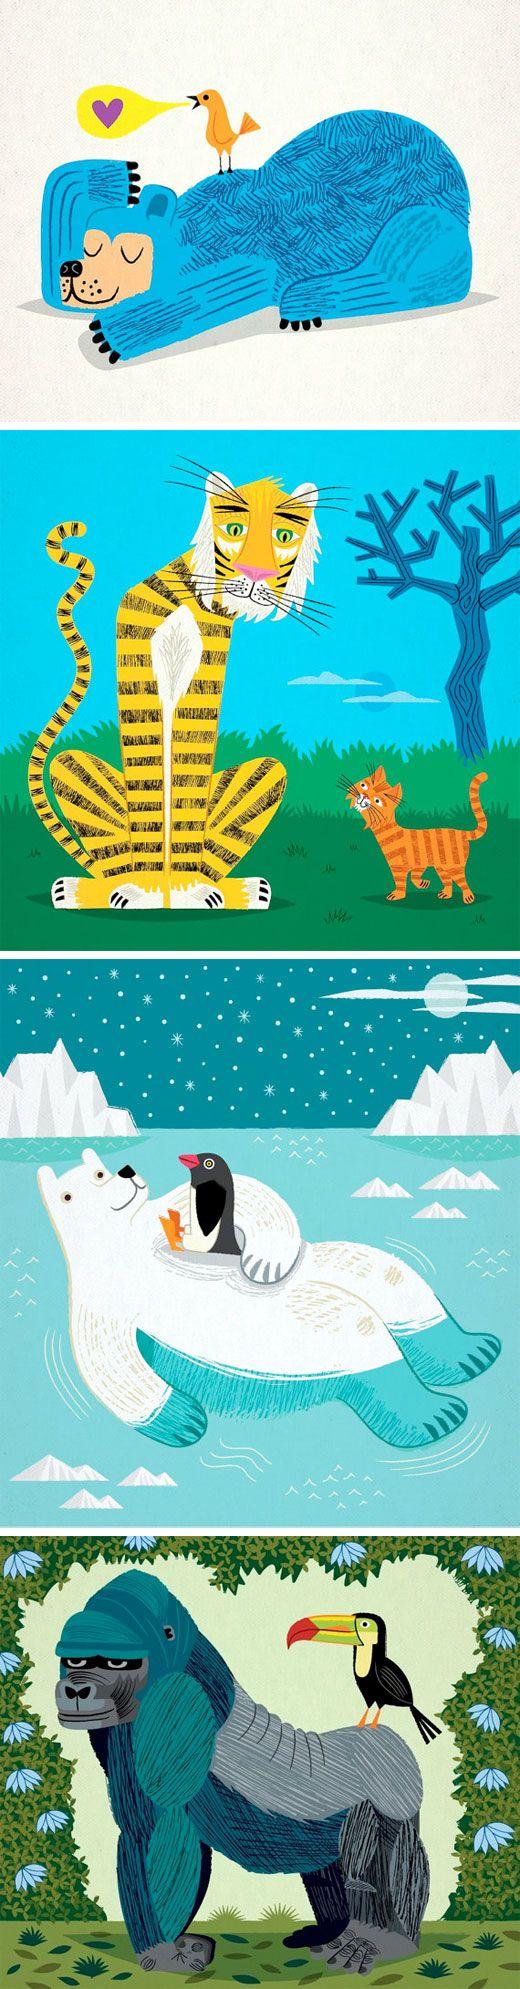 64 best Animal inspirations images on Pinterest | Mosaic animals ...